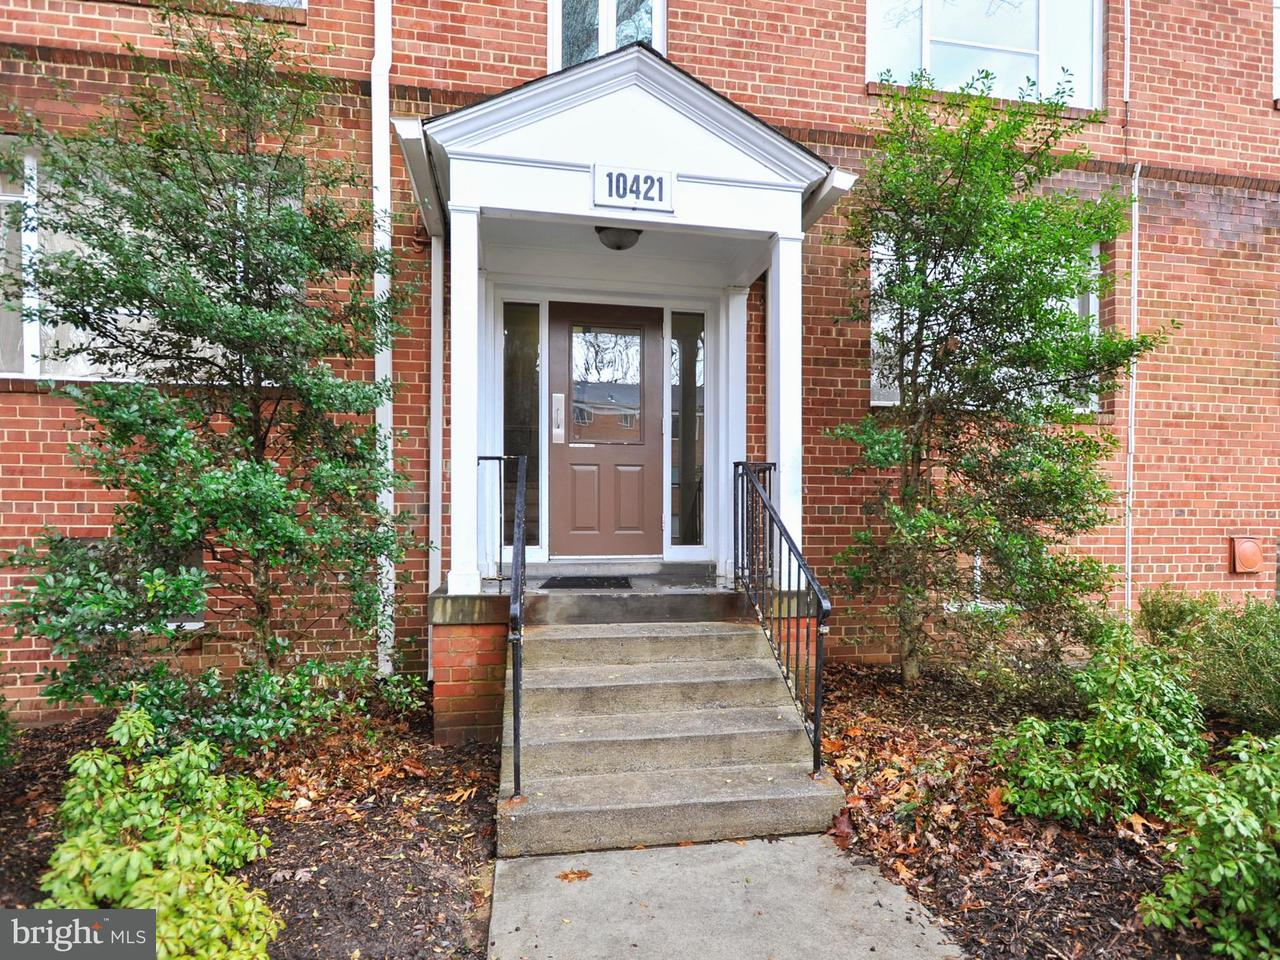 Condominium for Sale at 10421 Montrose Ave #m-2 Bethesda, Maryland 20814 United States